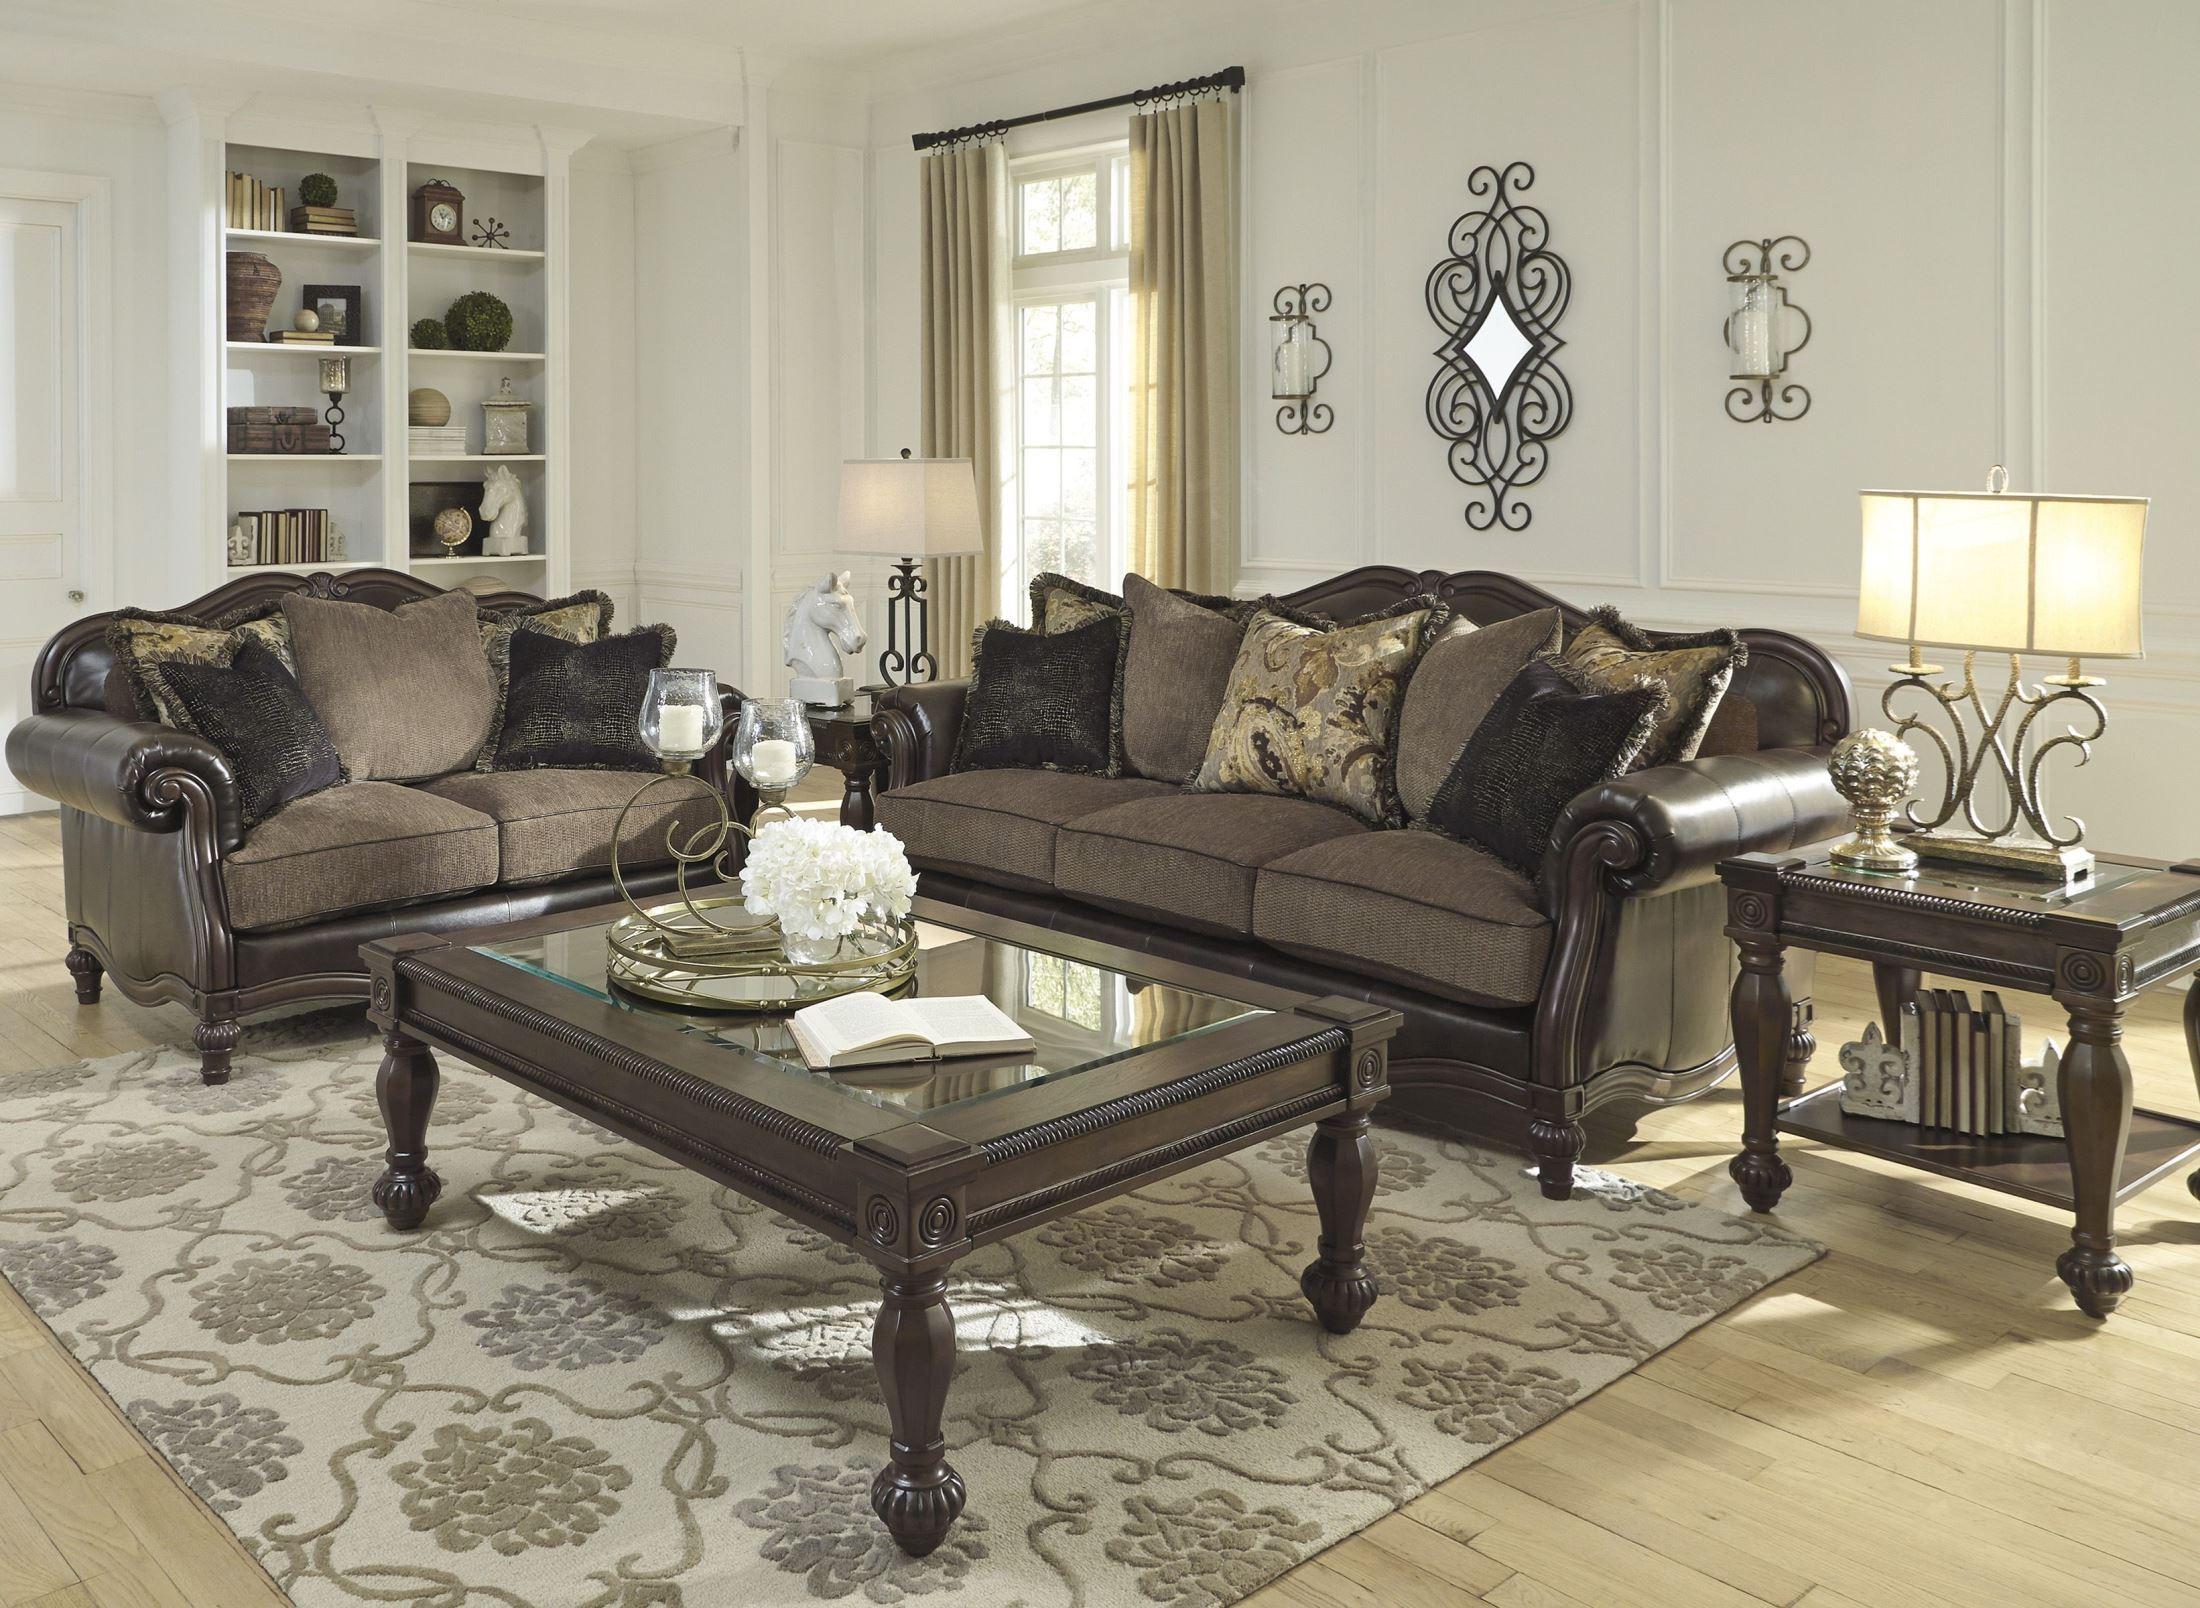 Winnsboro DuraBlend Vintage Living Room Set Media Gallery 1